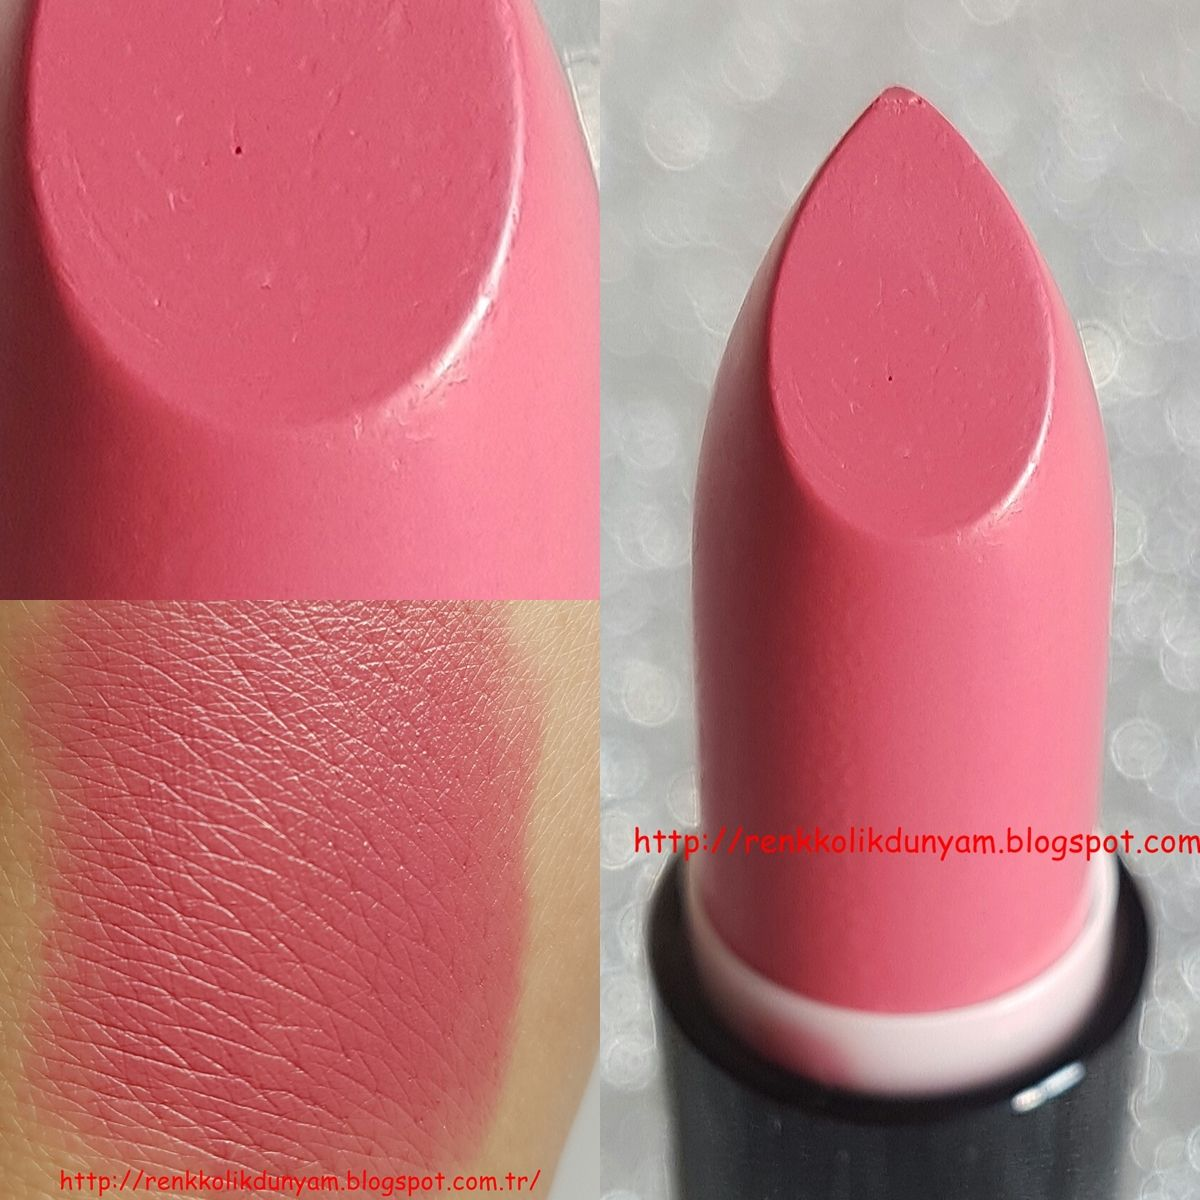 Rimmel Kate Moss Lasting Finish Matte Lipstick - 105